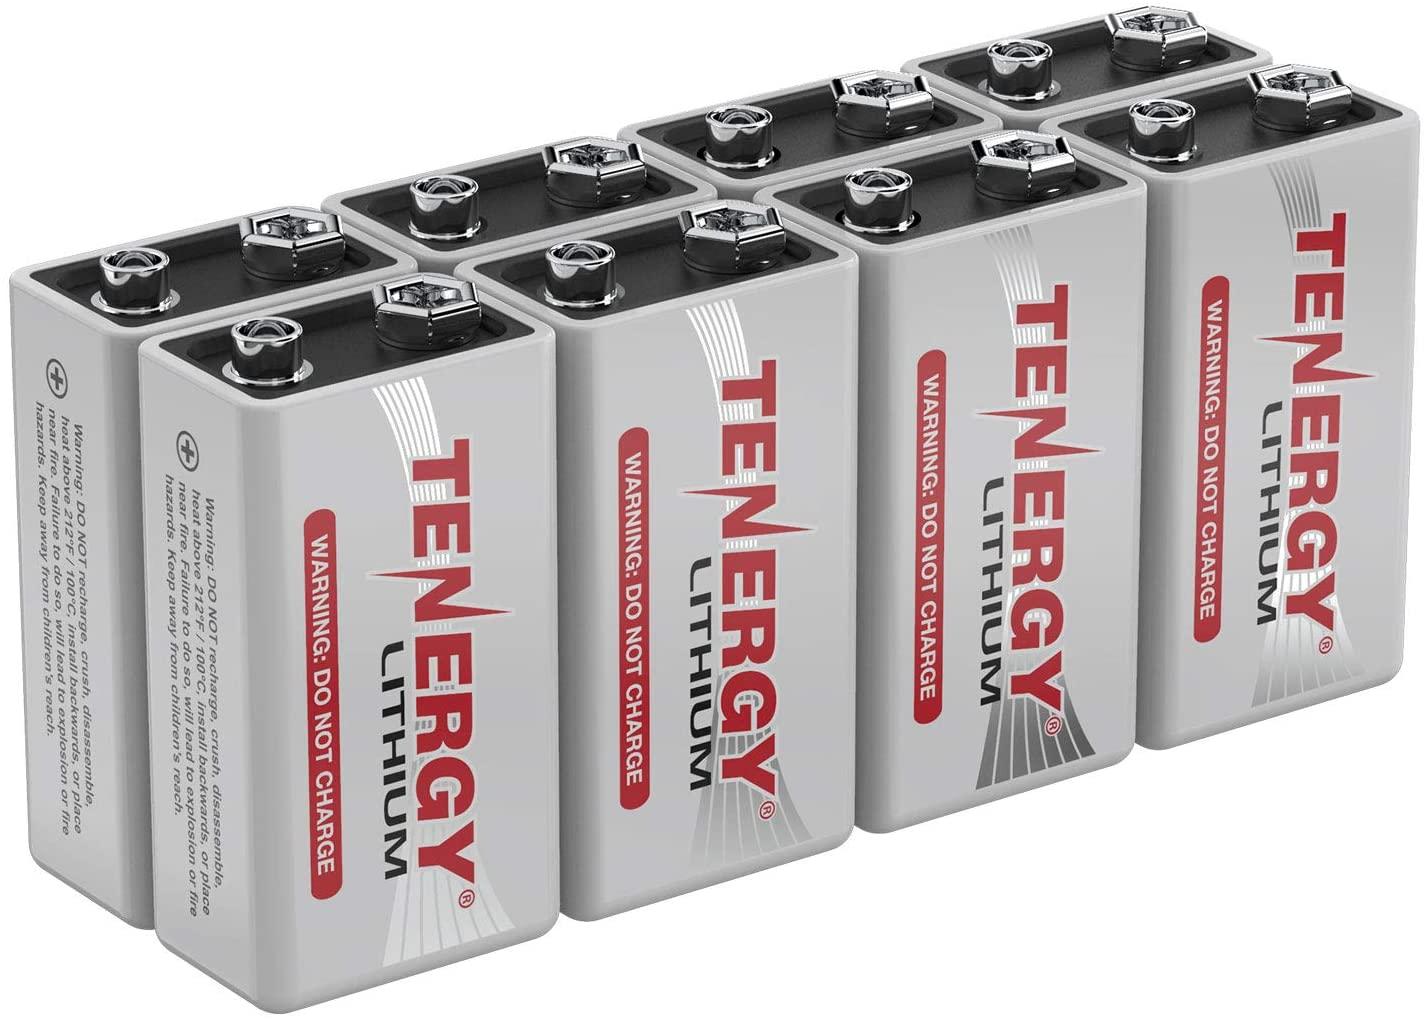 Tenergy 9V Lithium Batteries, 1200mah Non-Rechargeable Batteries,10 Years Shelf Life Lithium 9 Volt Batteries - 8 Pack